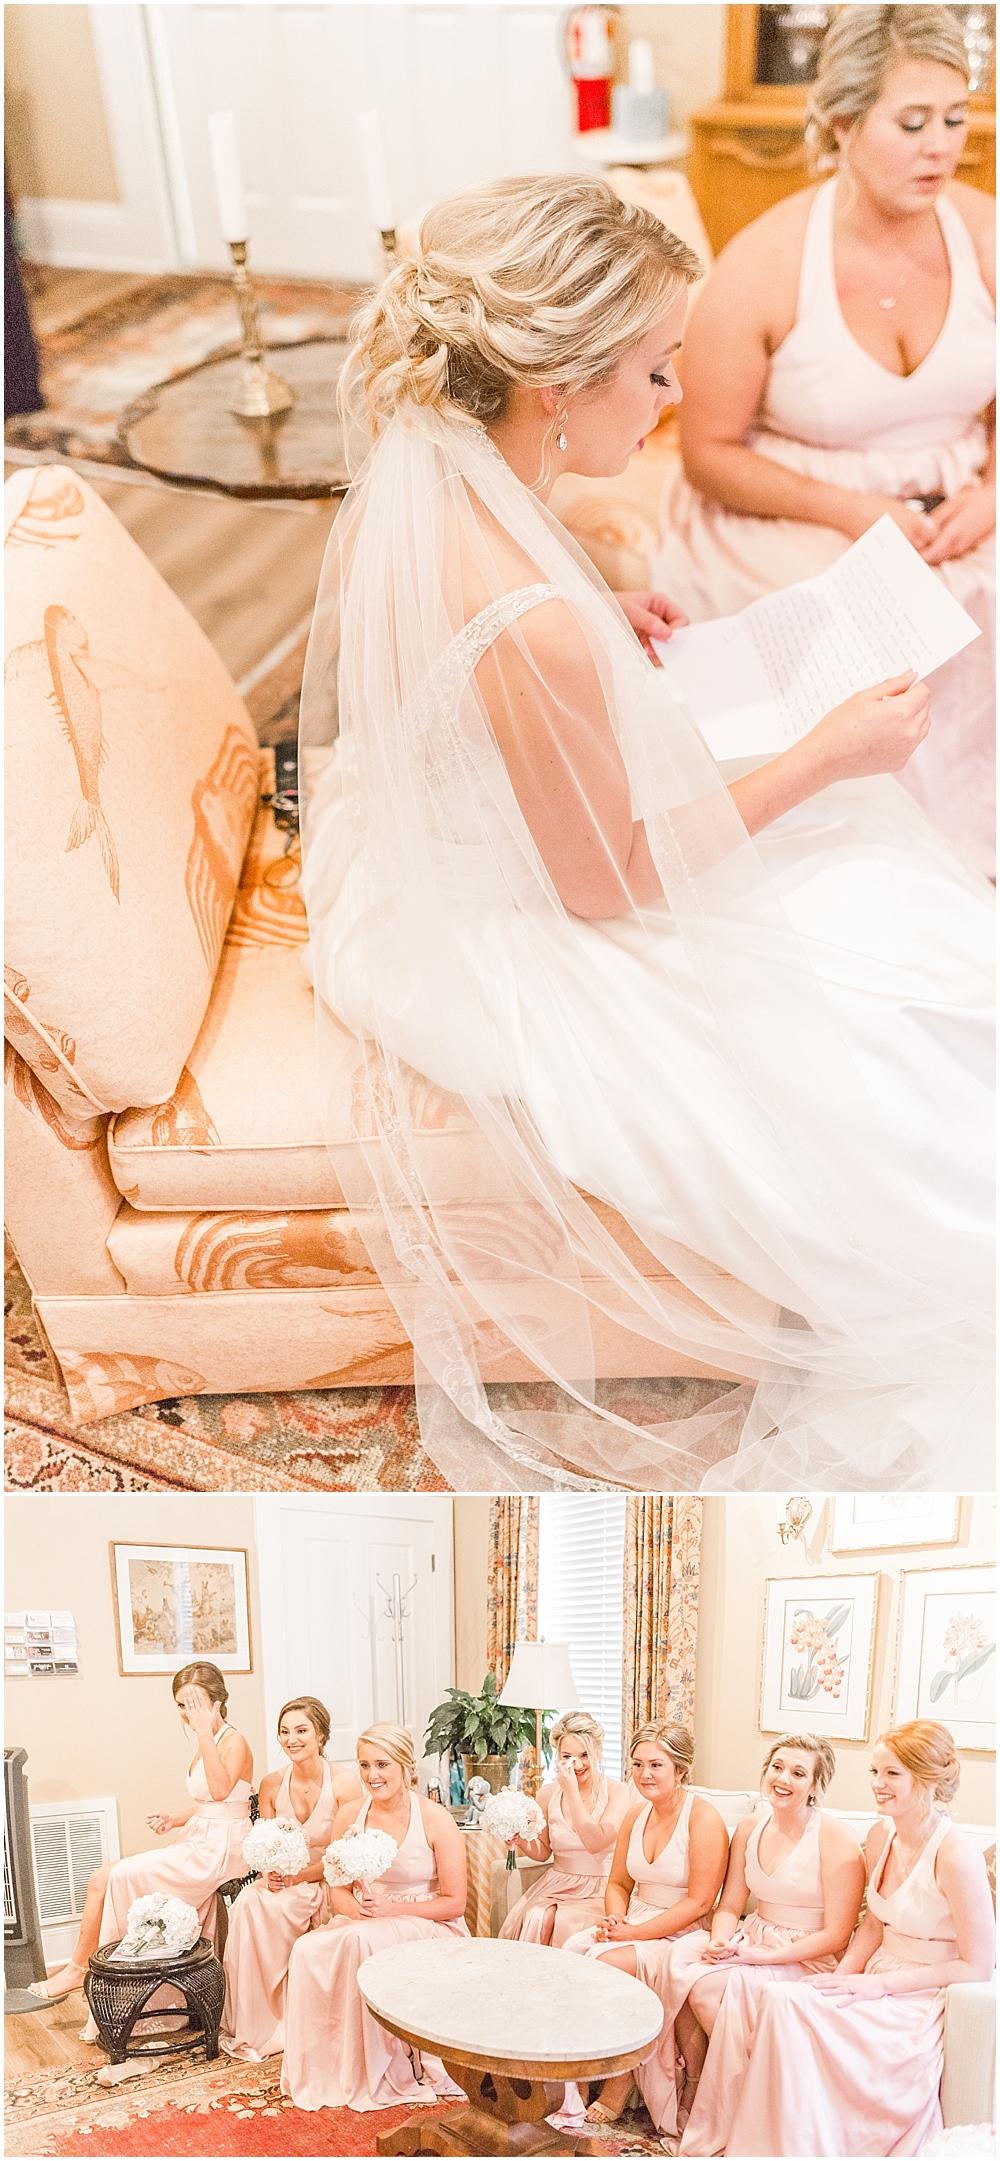 Ashton-Clark-Photography-Wedding-Portrait-Family-Photographer-Mobile-Alabama_0310.jpg